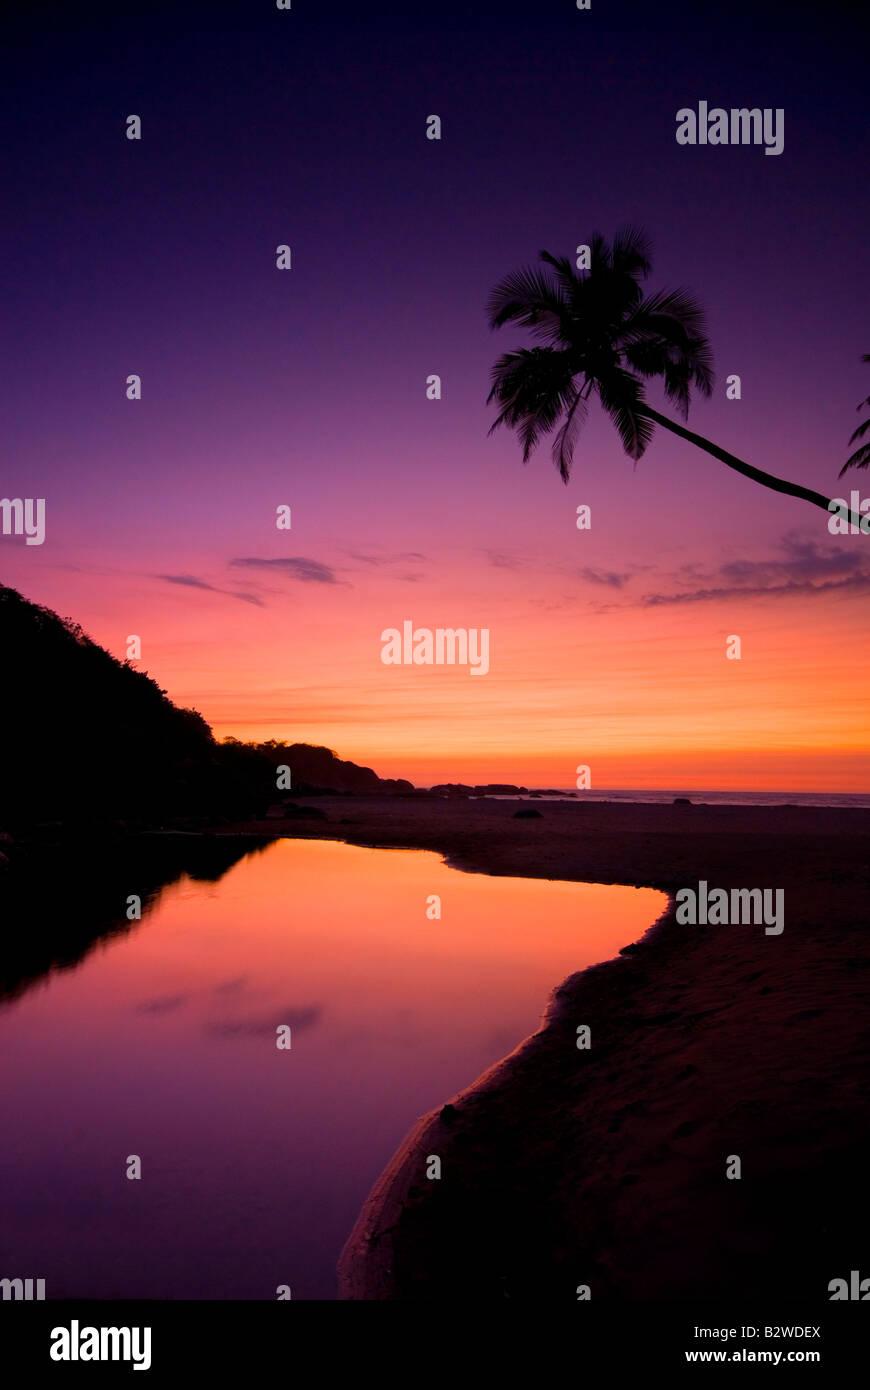 Sunset at Agonda Beach, South Goa, India, Asia - Stock Image